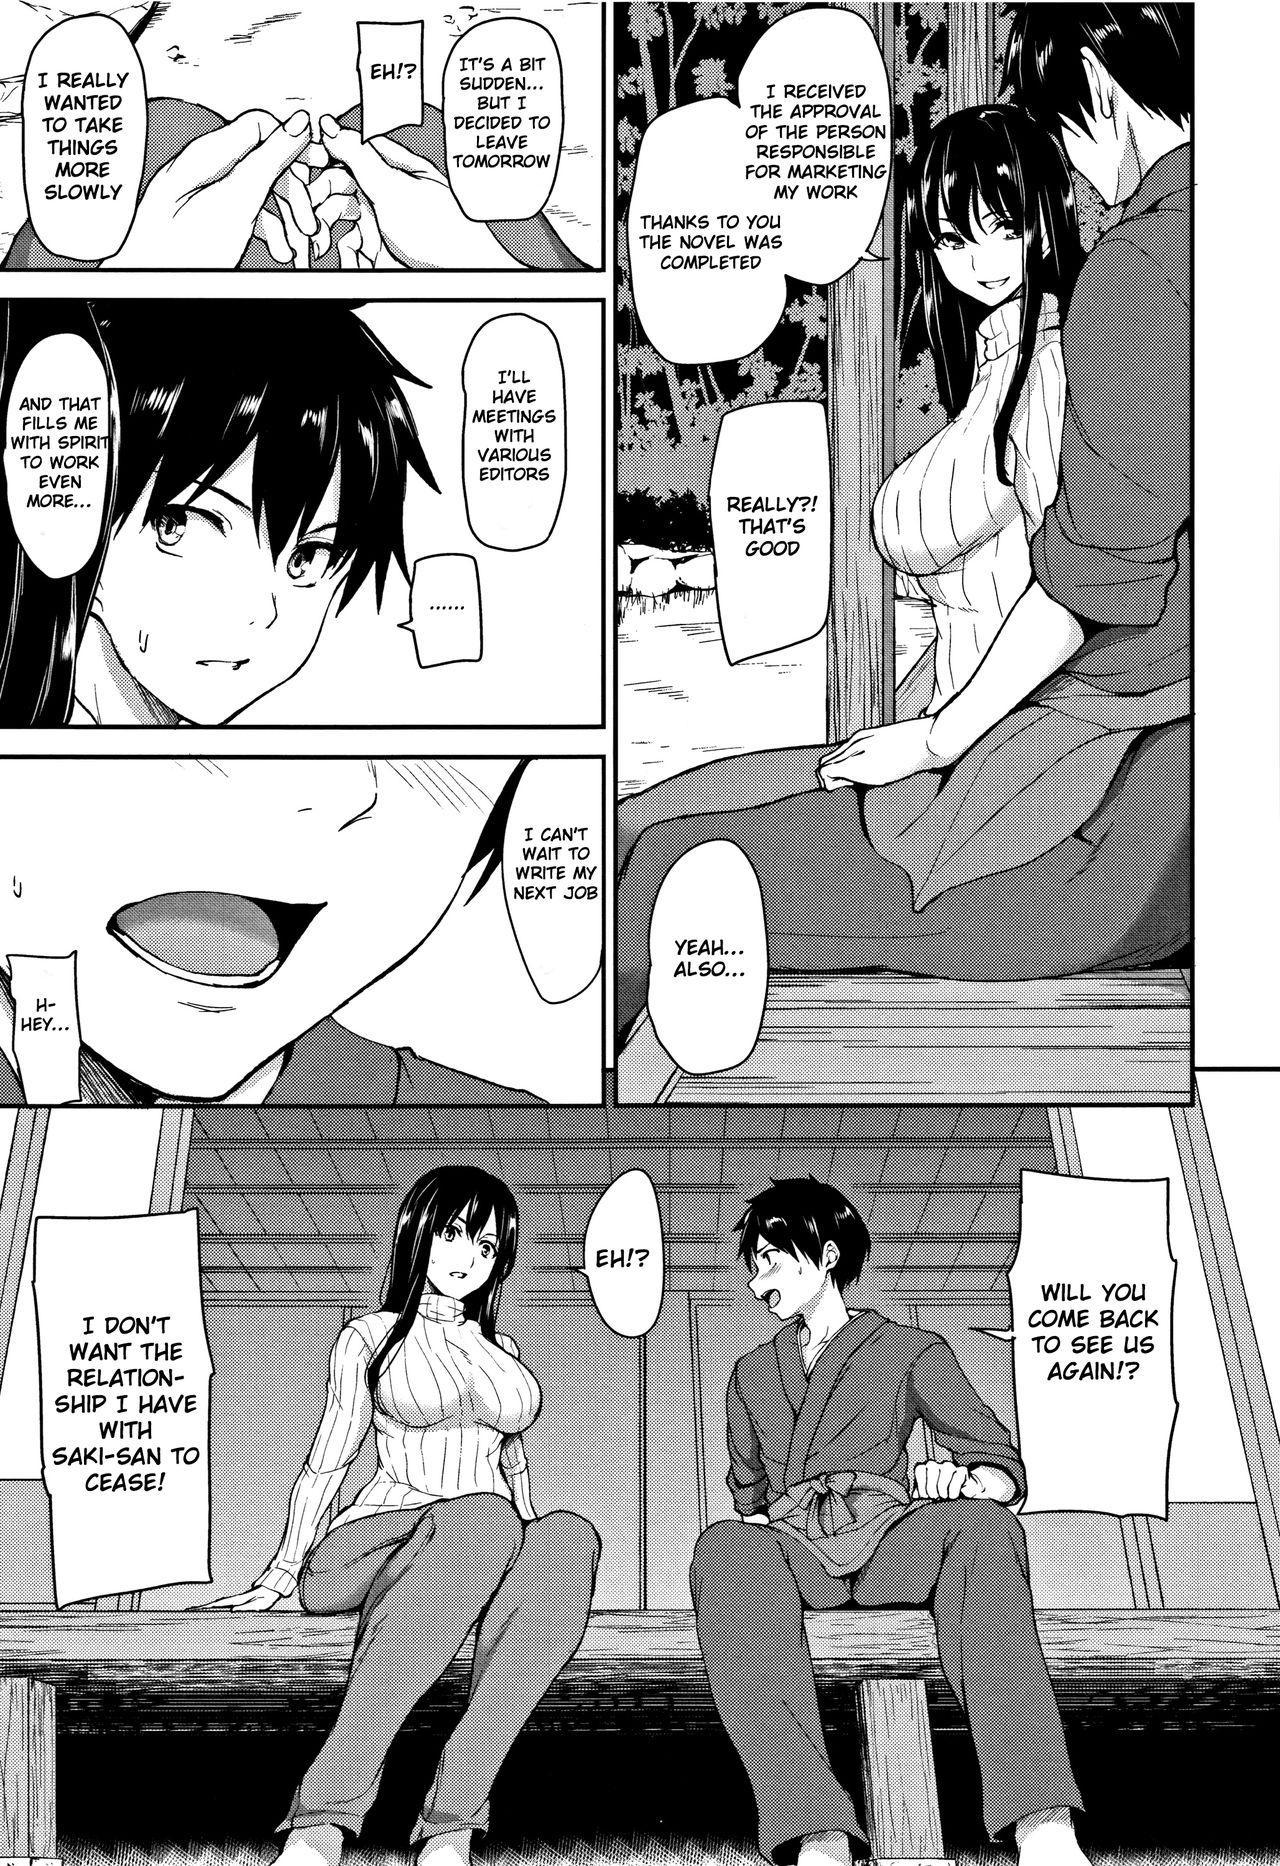 Yukemuri Harem Monogatari Saishuuwa | Yukemuri Harem Monogatari Final Chapter 2